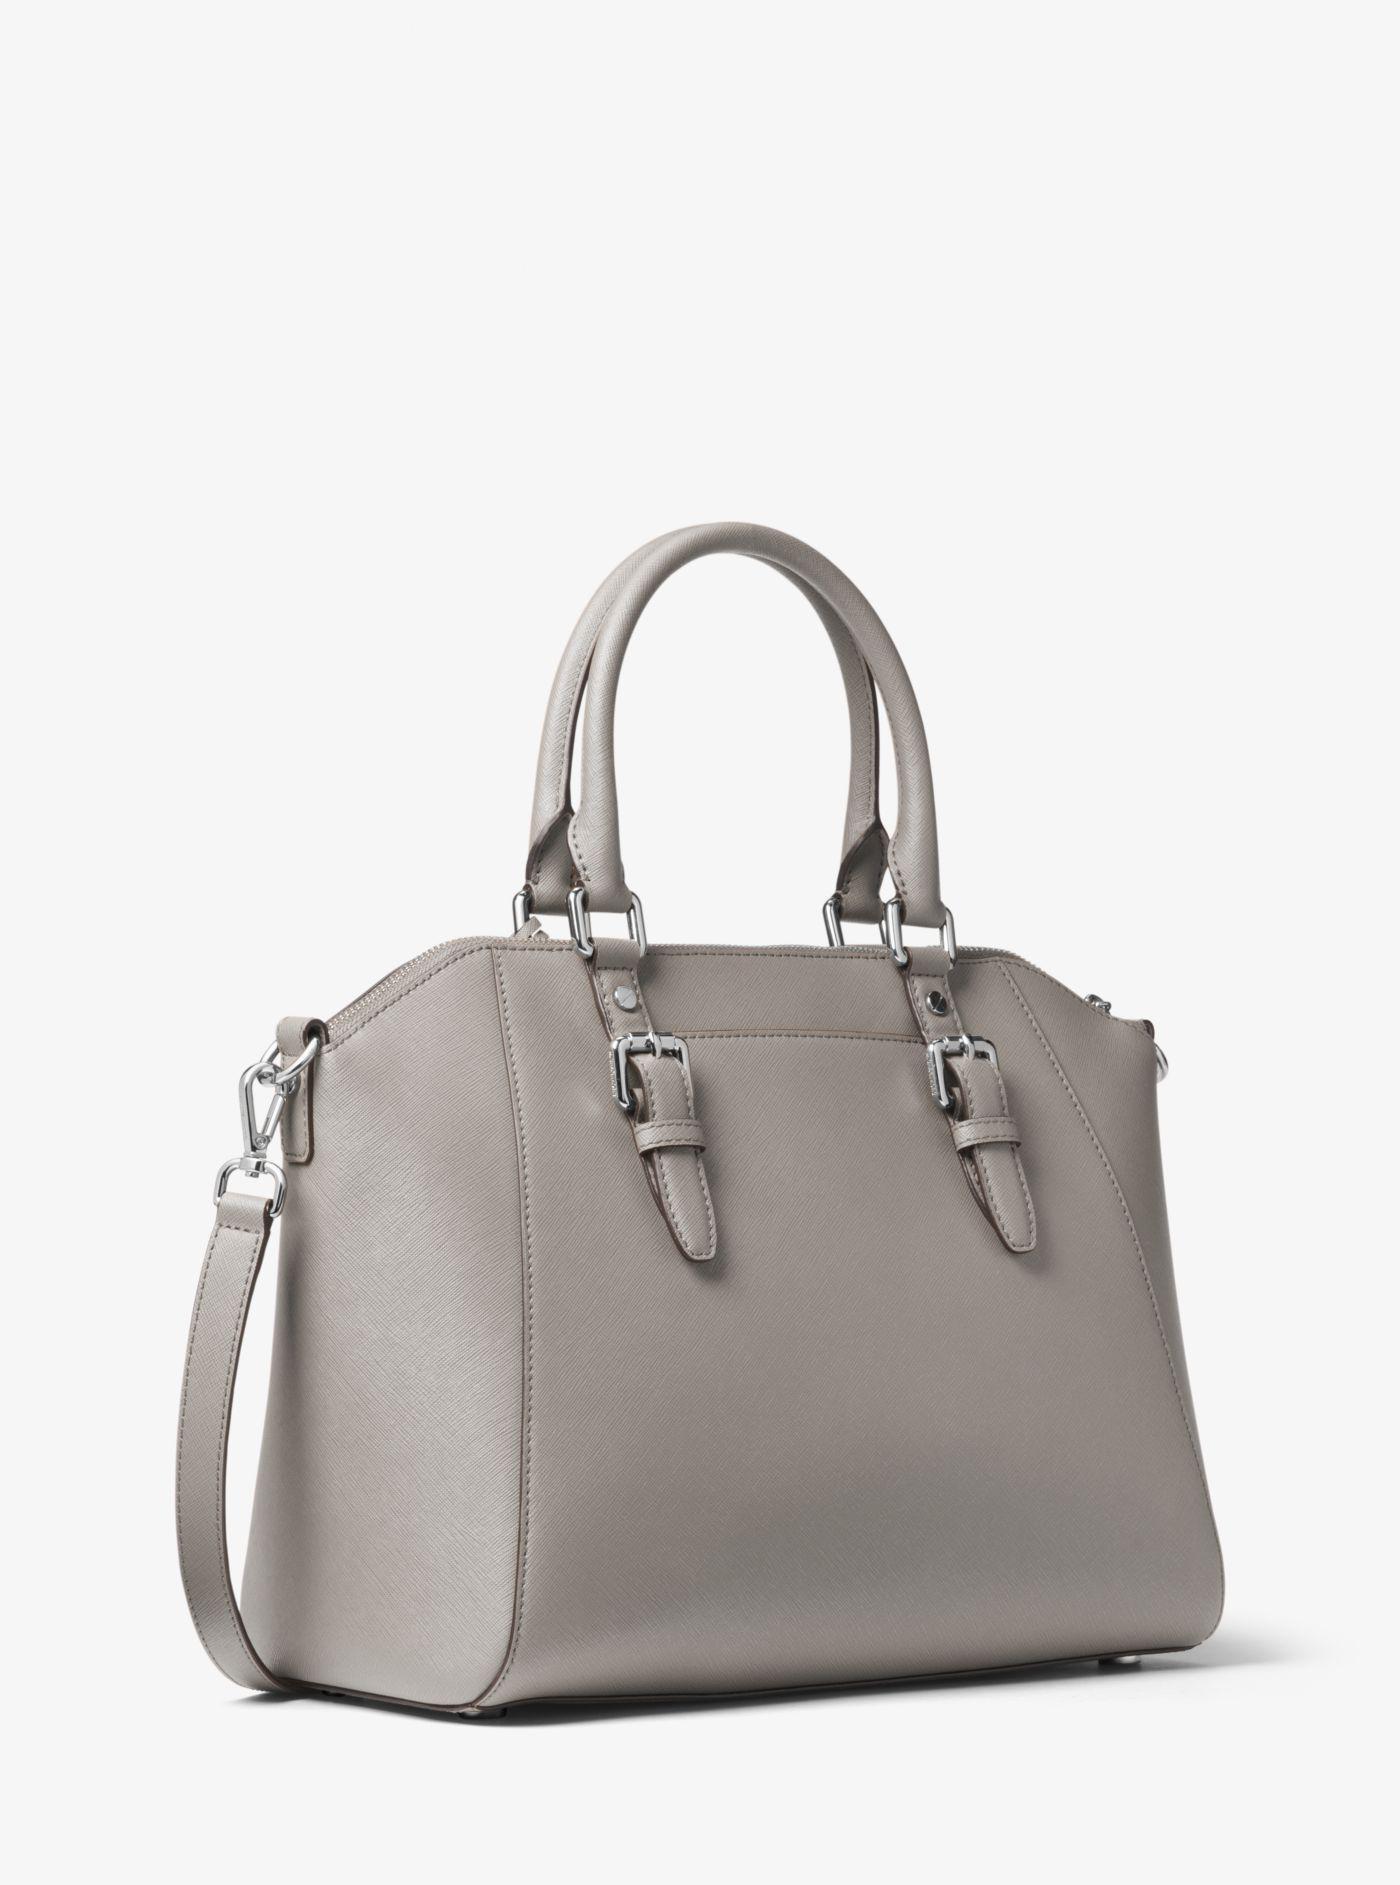 58f53f431ec68 Lyst - Michael Kors Ciara Large Saffiano Leather Satchel in Gray